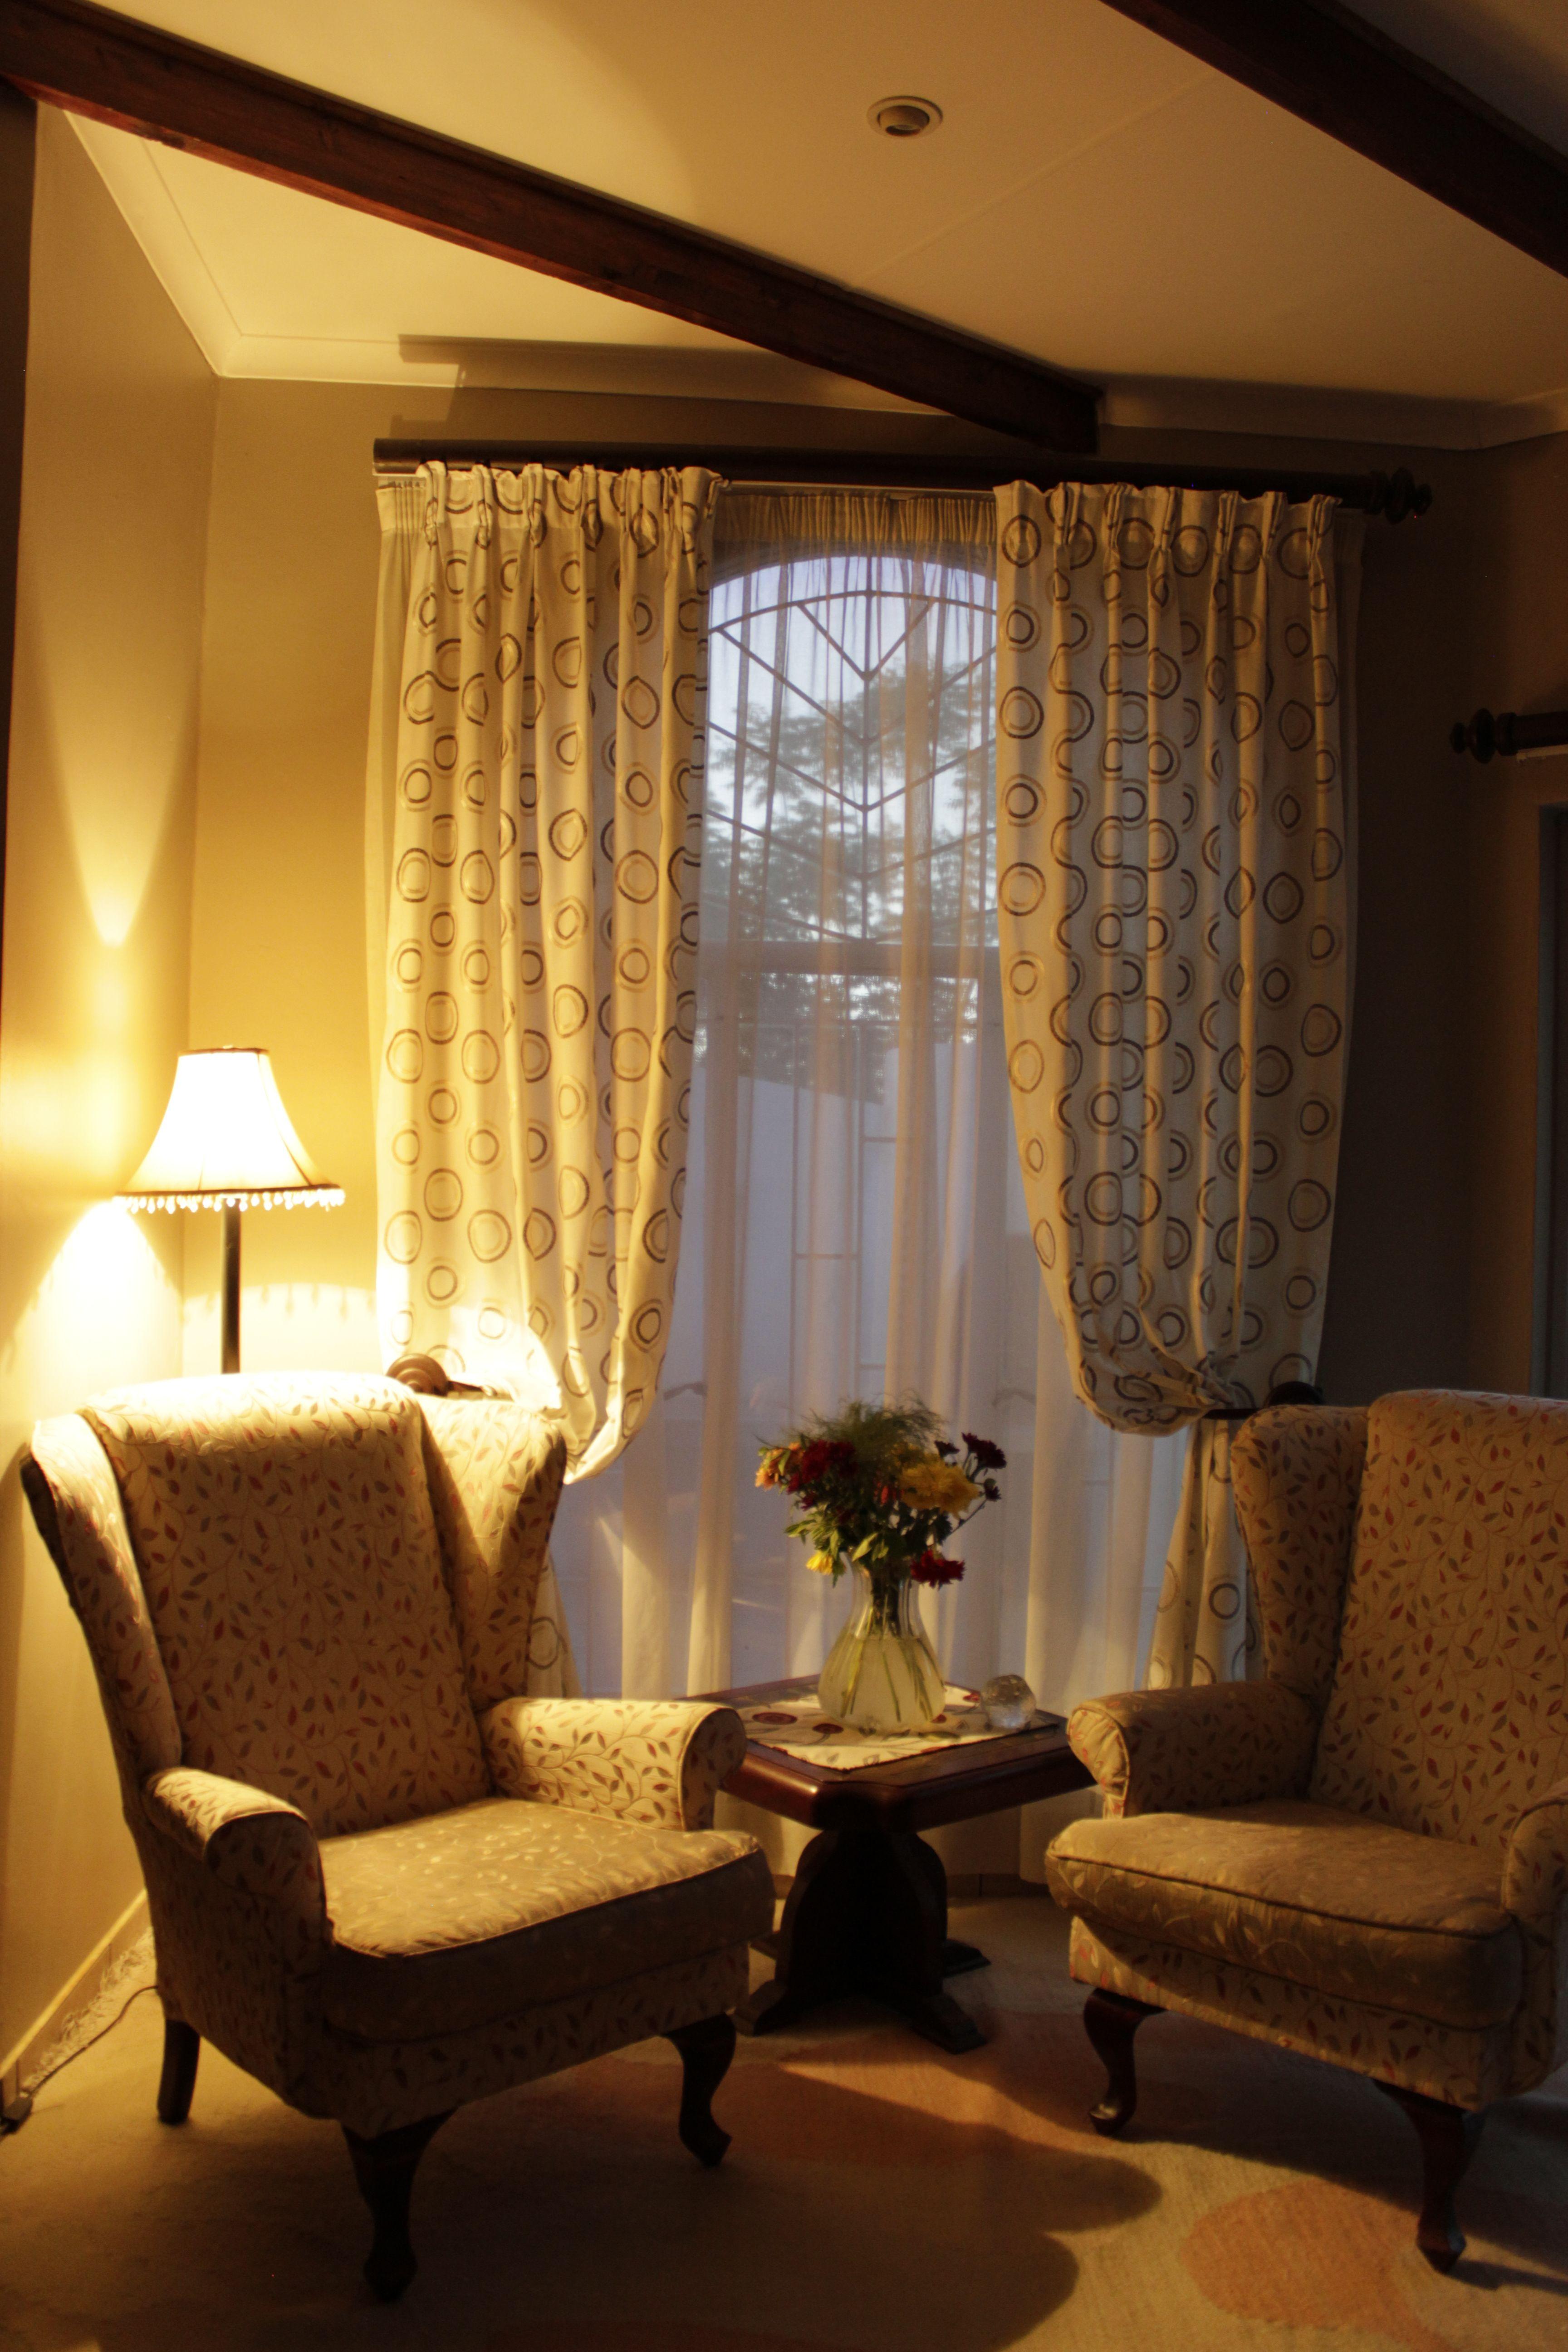 Stylish sitting room drape curtains with tie back bespoke custom ...